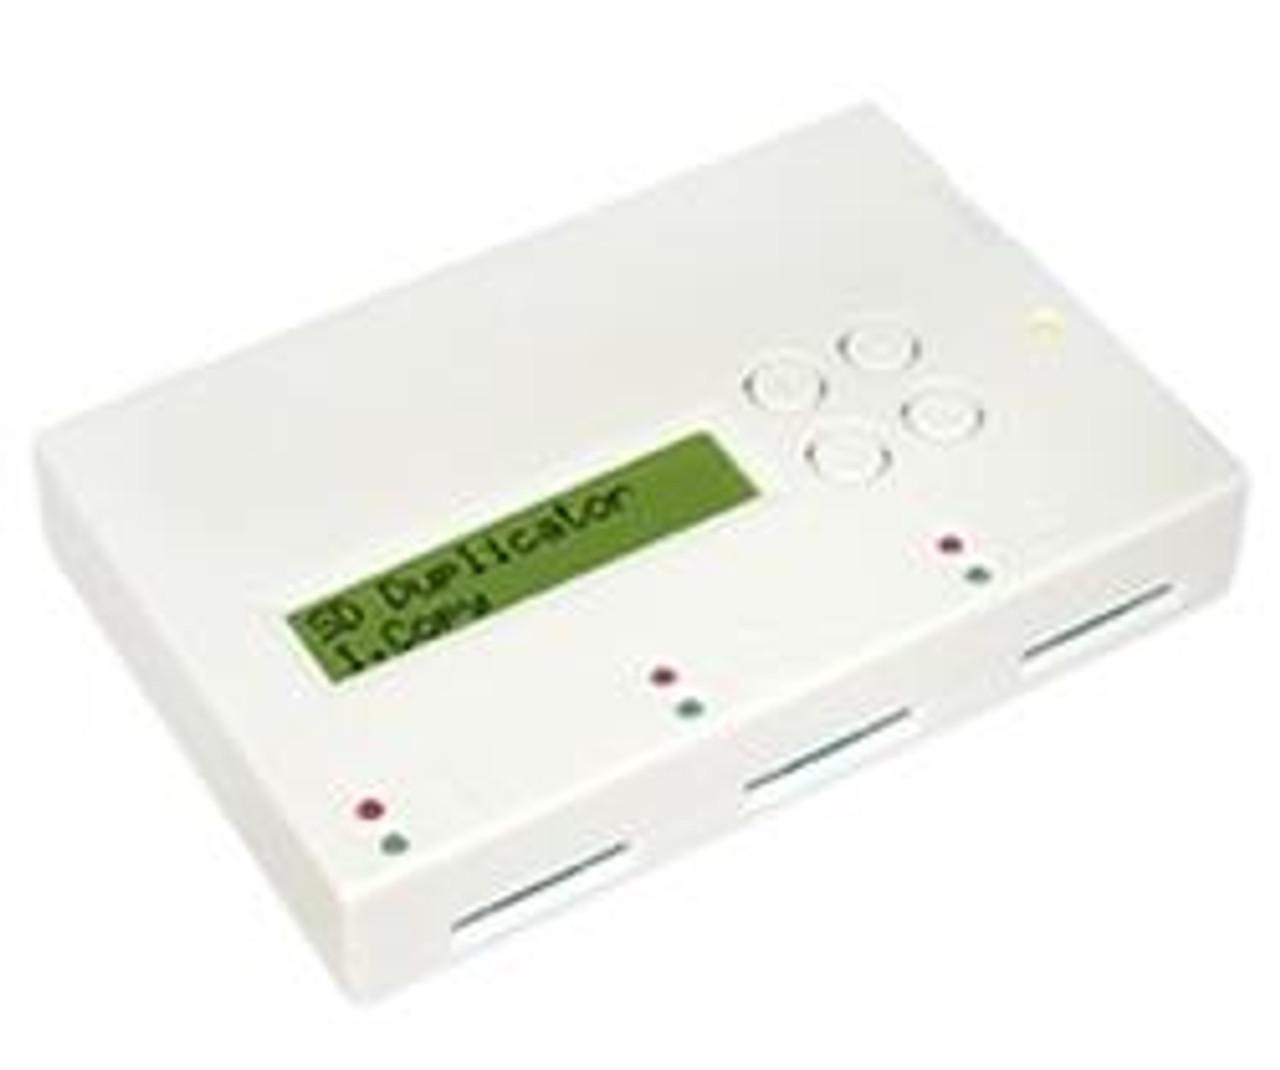 DupliSD Series SD/microSD Memory Card Duplicator and Eraser